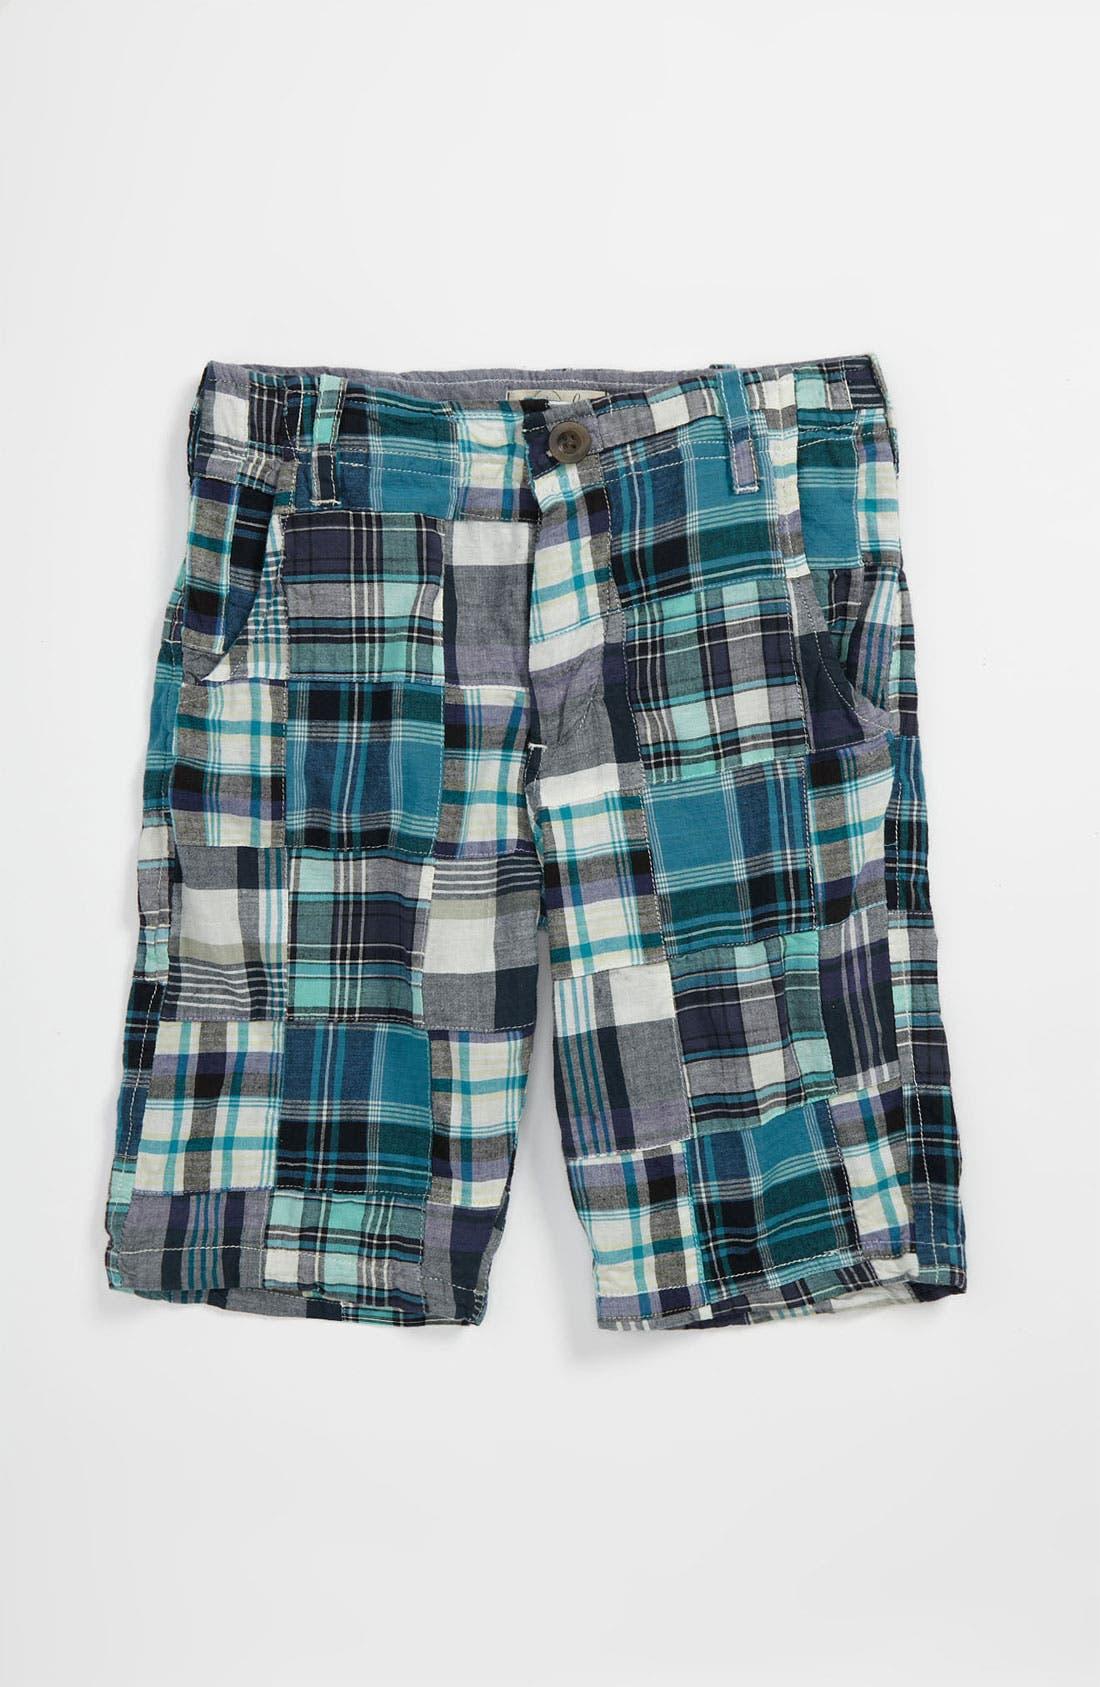 Alternate Image 1 Selected - Peek 'Hampton' Shorts (Toddler, Little Boys & Big Boys)